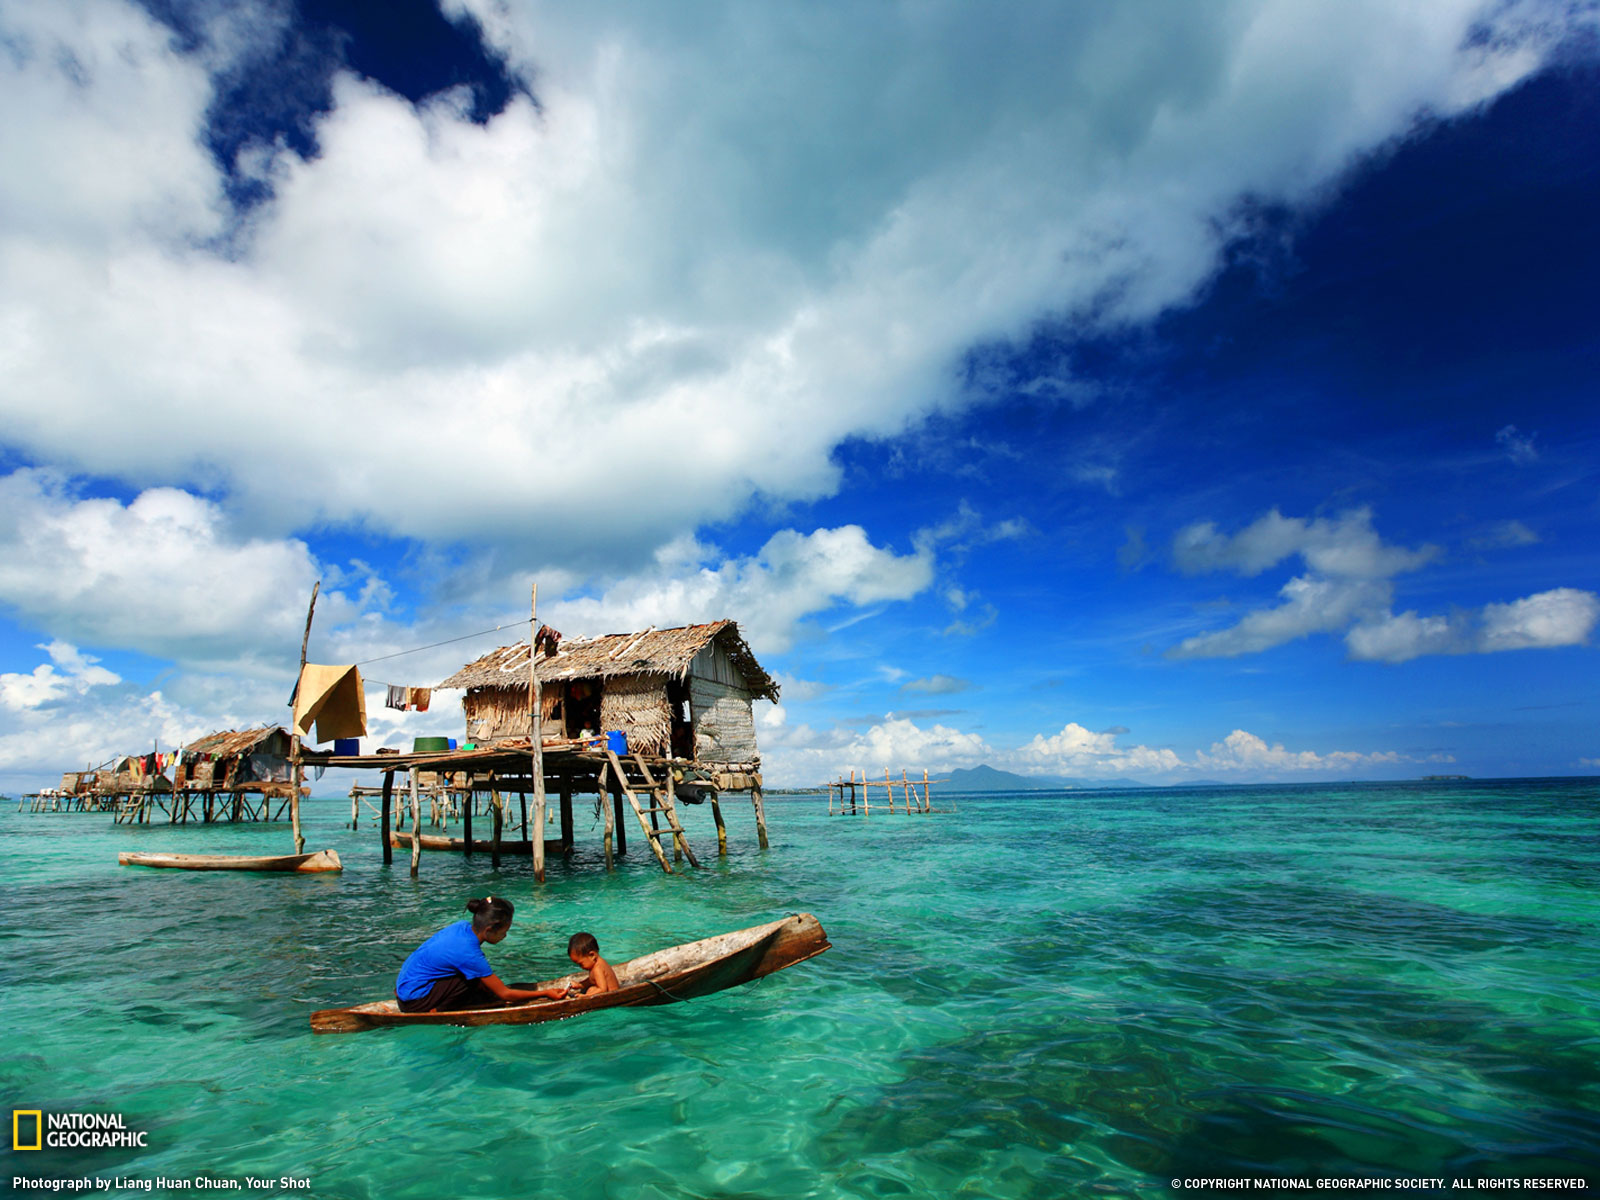 http://4.bp.blogspot.com/_ianexESs_IE/TNn5lTGoQNI/AAAAAAAAAO0/FwgJoqpg8qI/s1600/Fishing.jpg